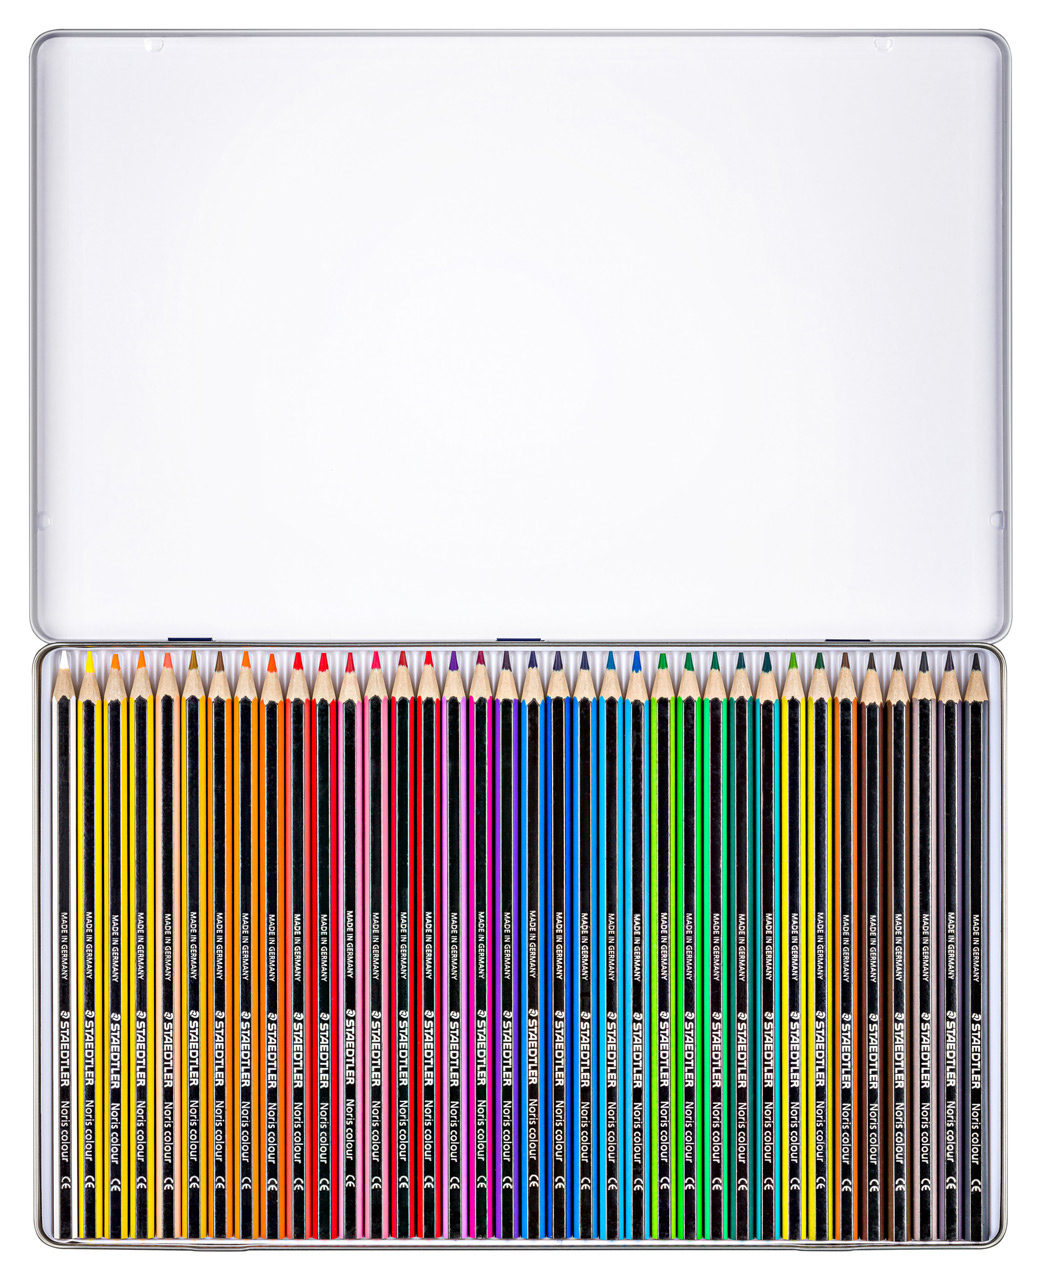 Staedtler-Noris-colour-185-Farbstift-36-Set-Metalletui-offen-lafueliki